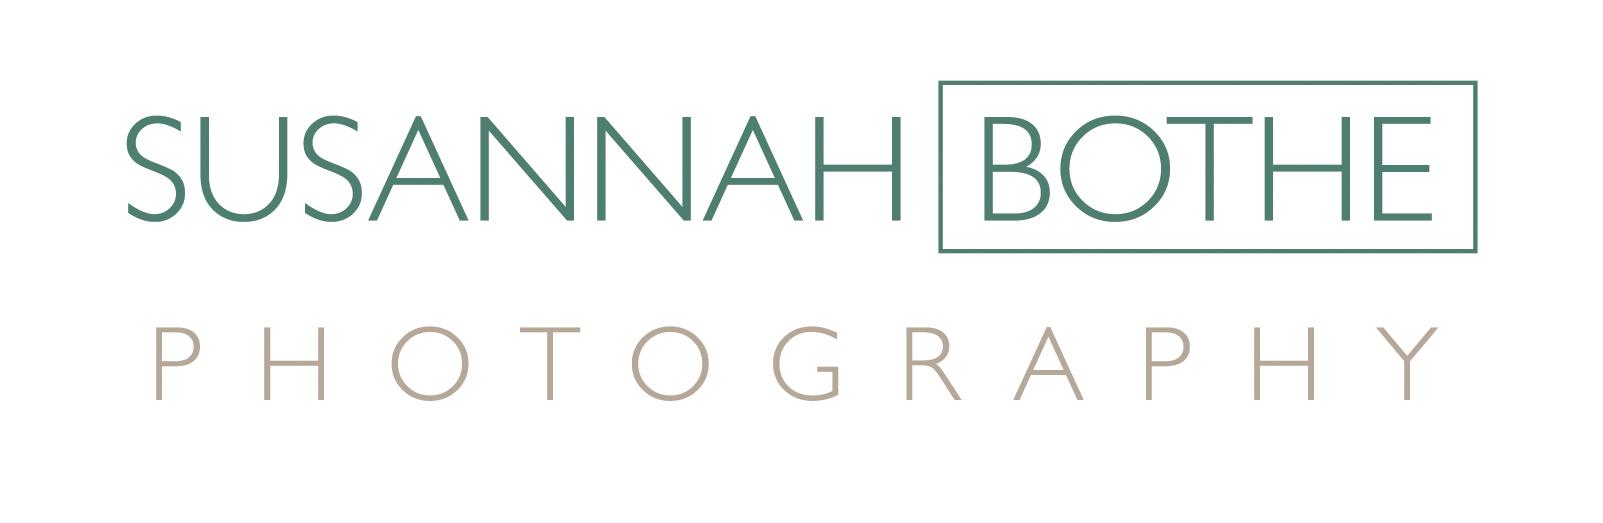 Susannah Bothe Photography